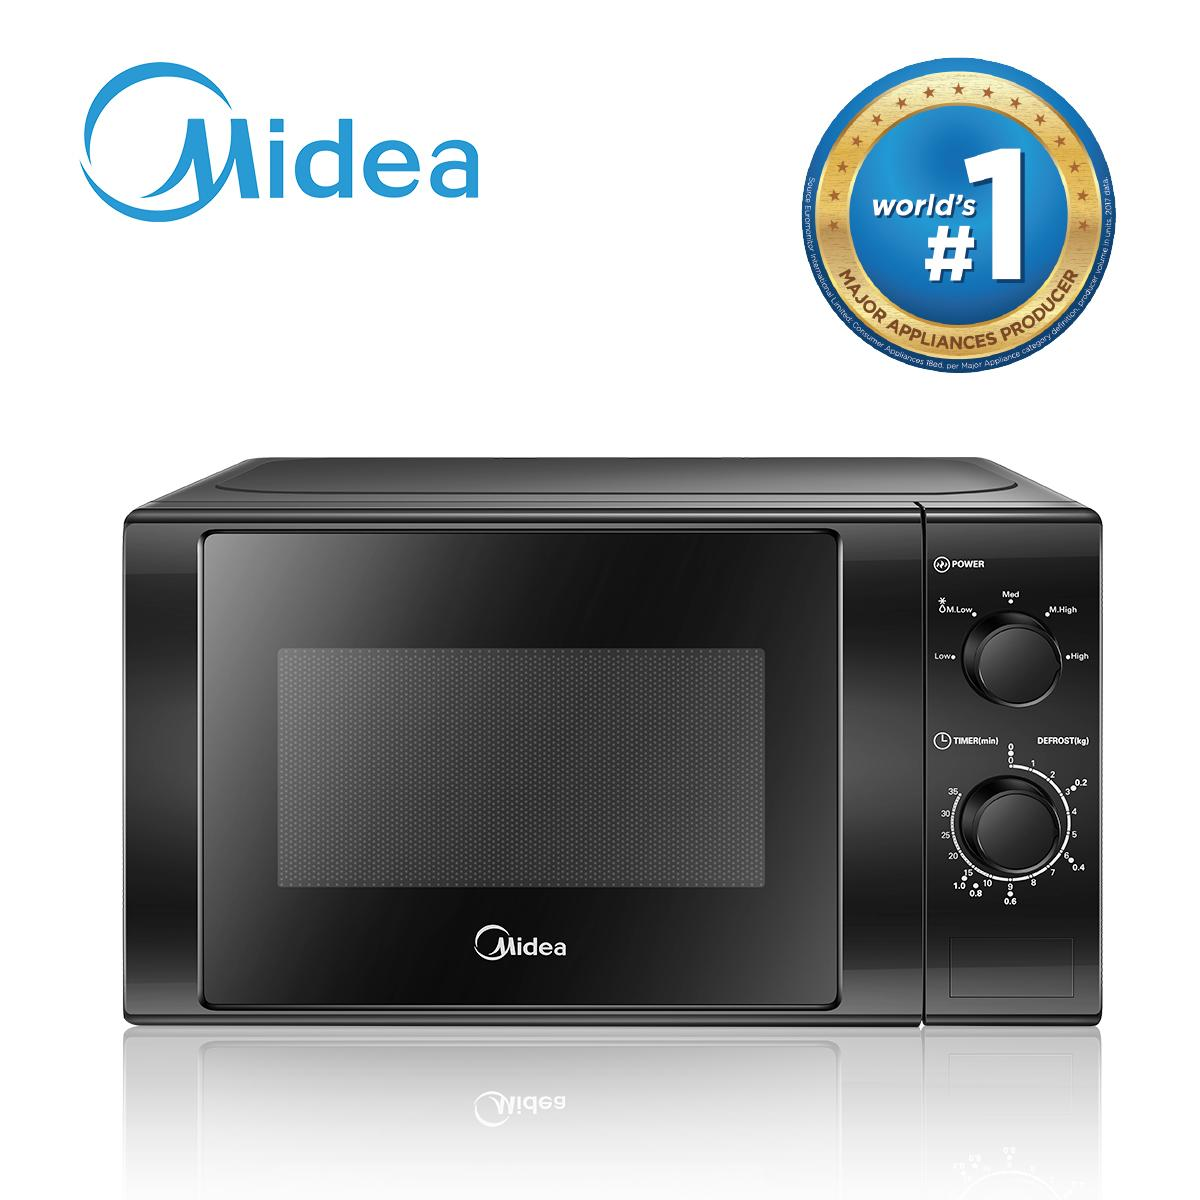 Midea Fp 61mmv020lmsm B1 20l Black Mechanical Mircrowave Oven